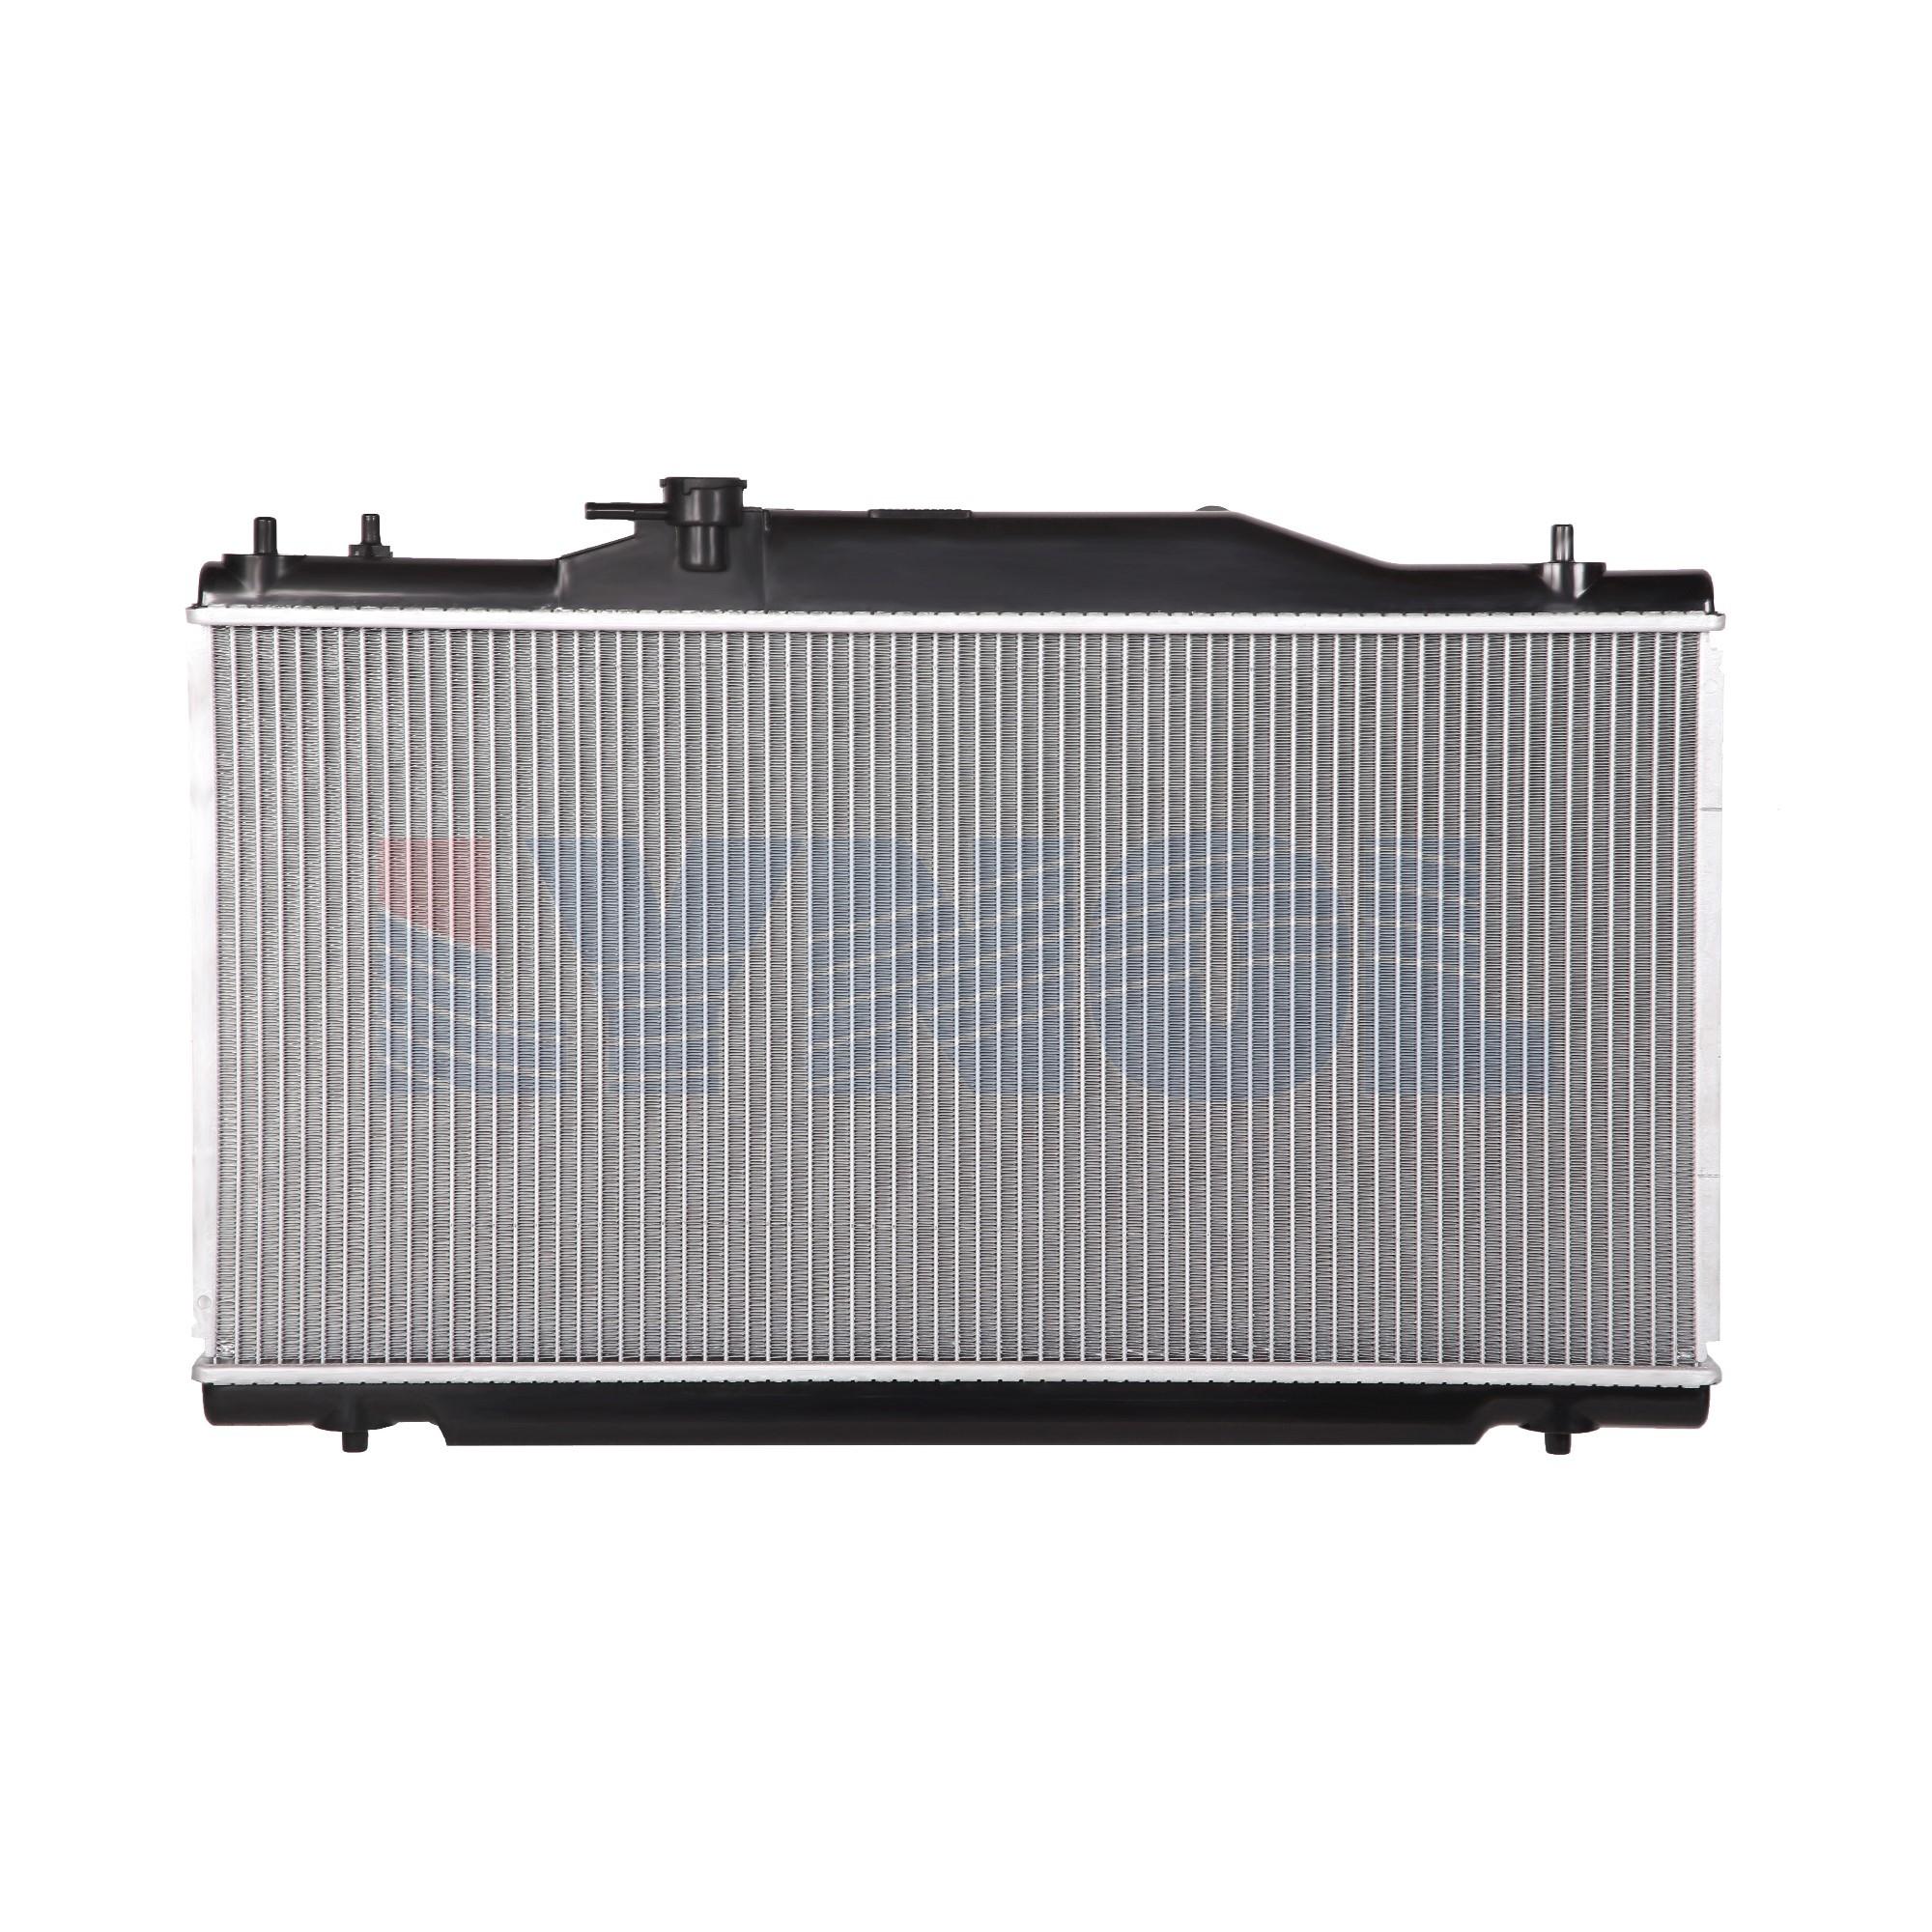 Lynol Truck Parts > Automotive Radiator > LR2412